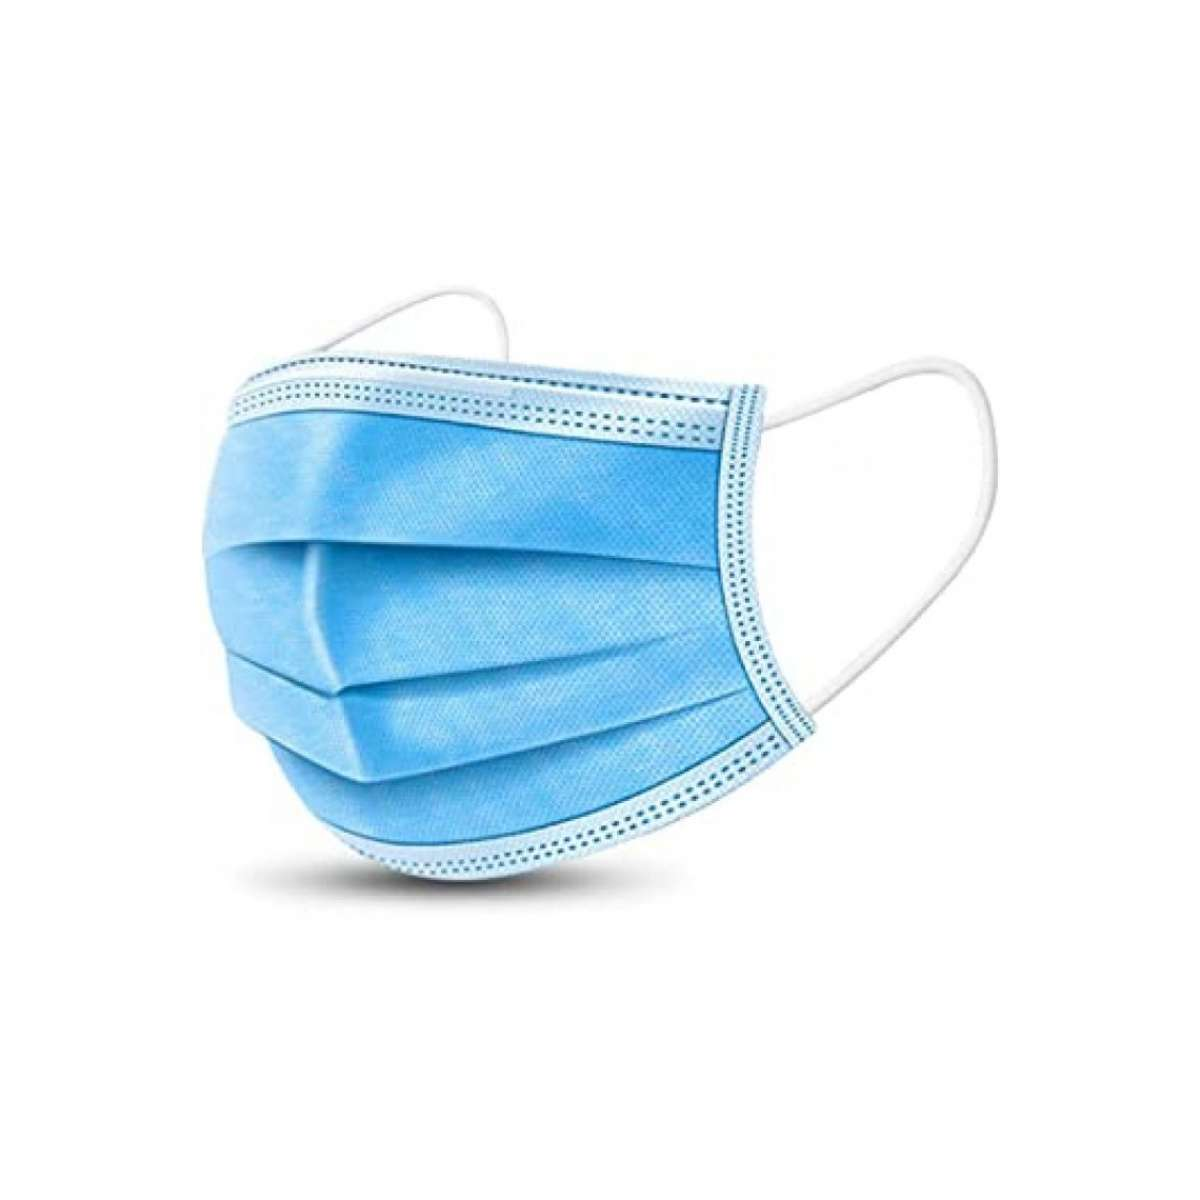 Medical Disposable Mask FDA (EarLoop) - Case of 2000